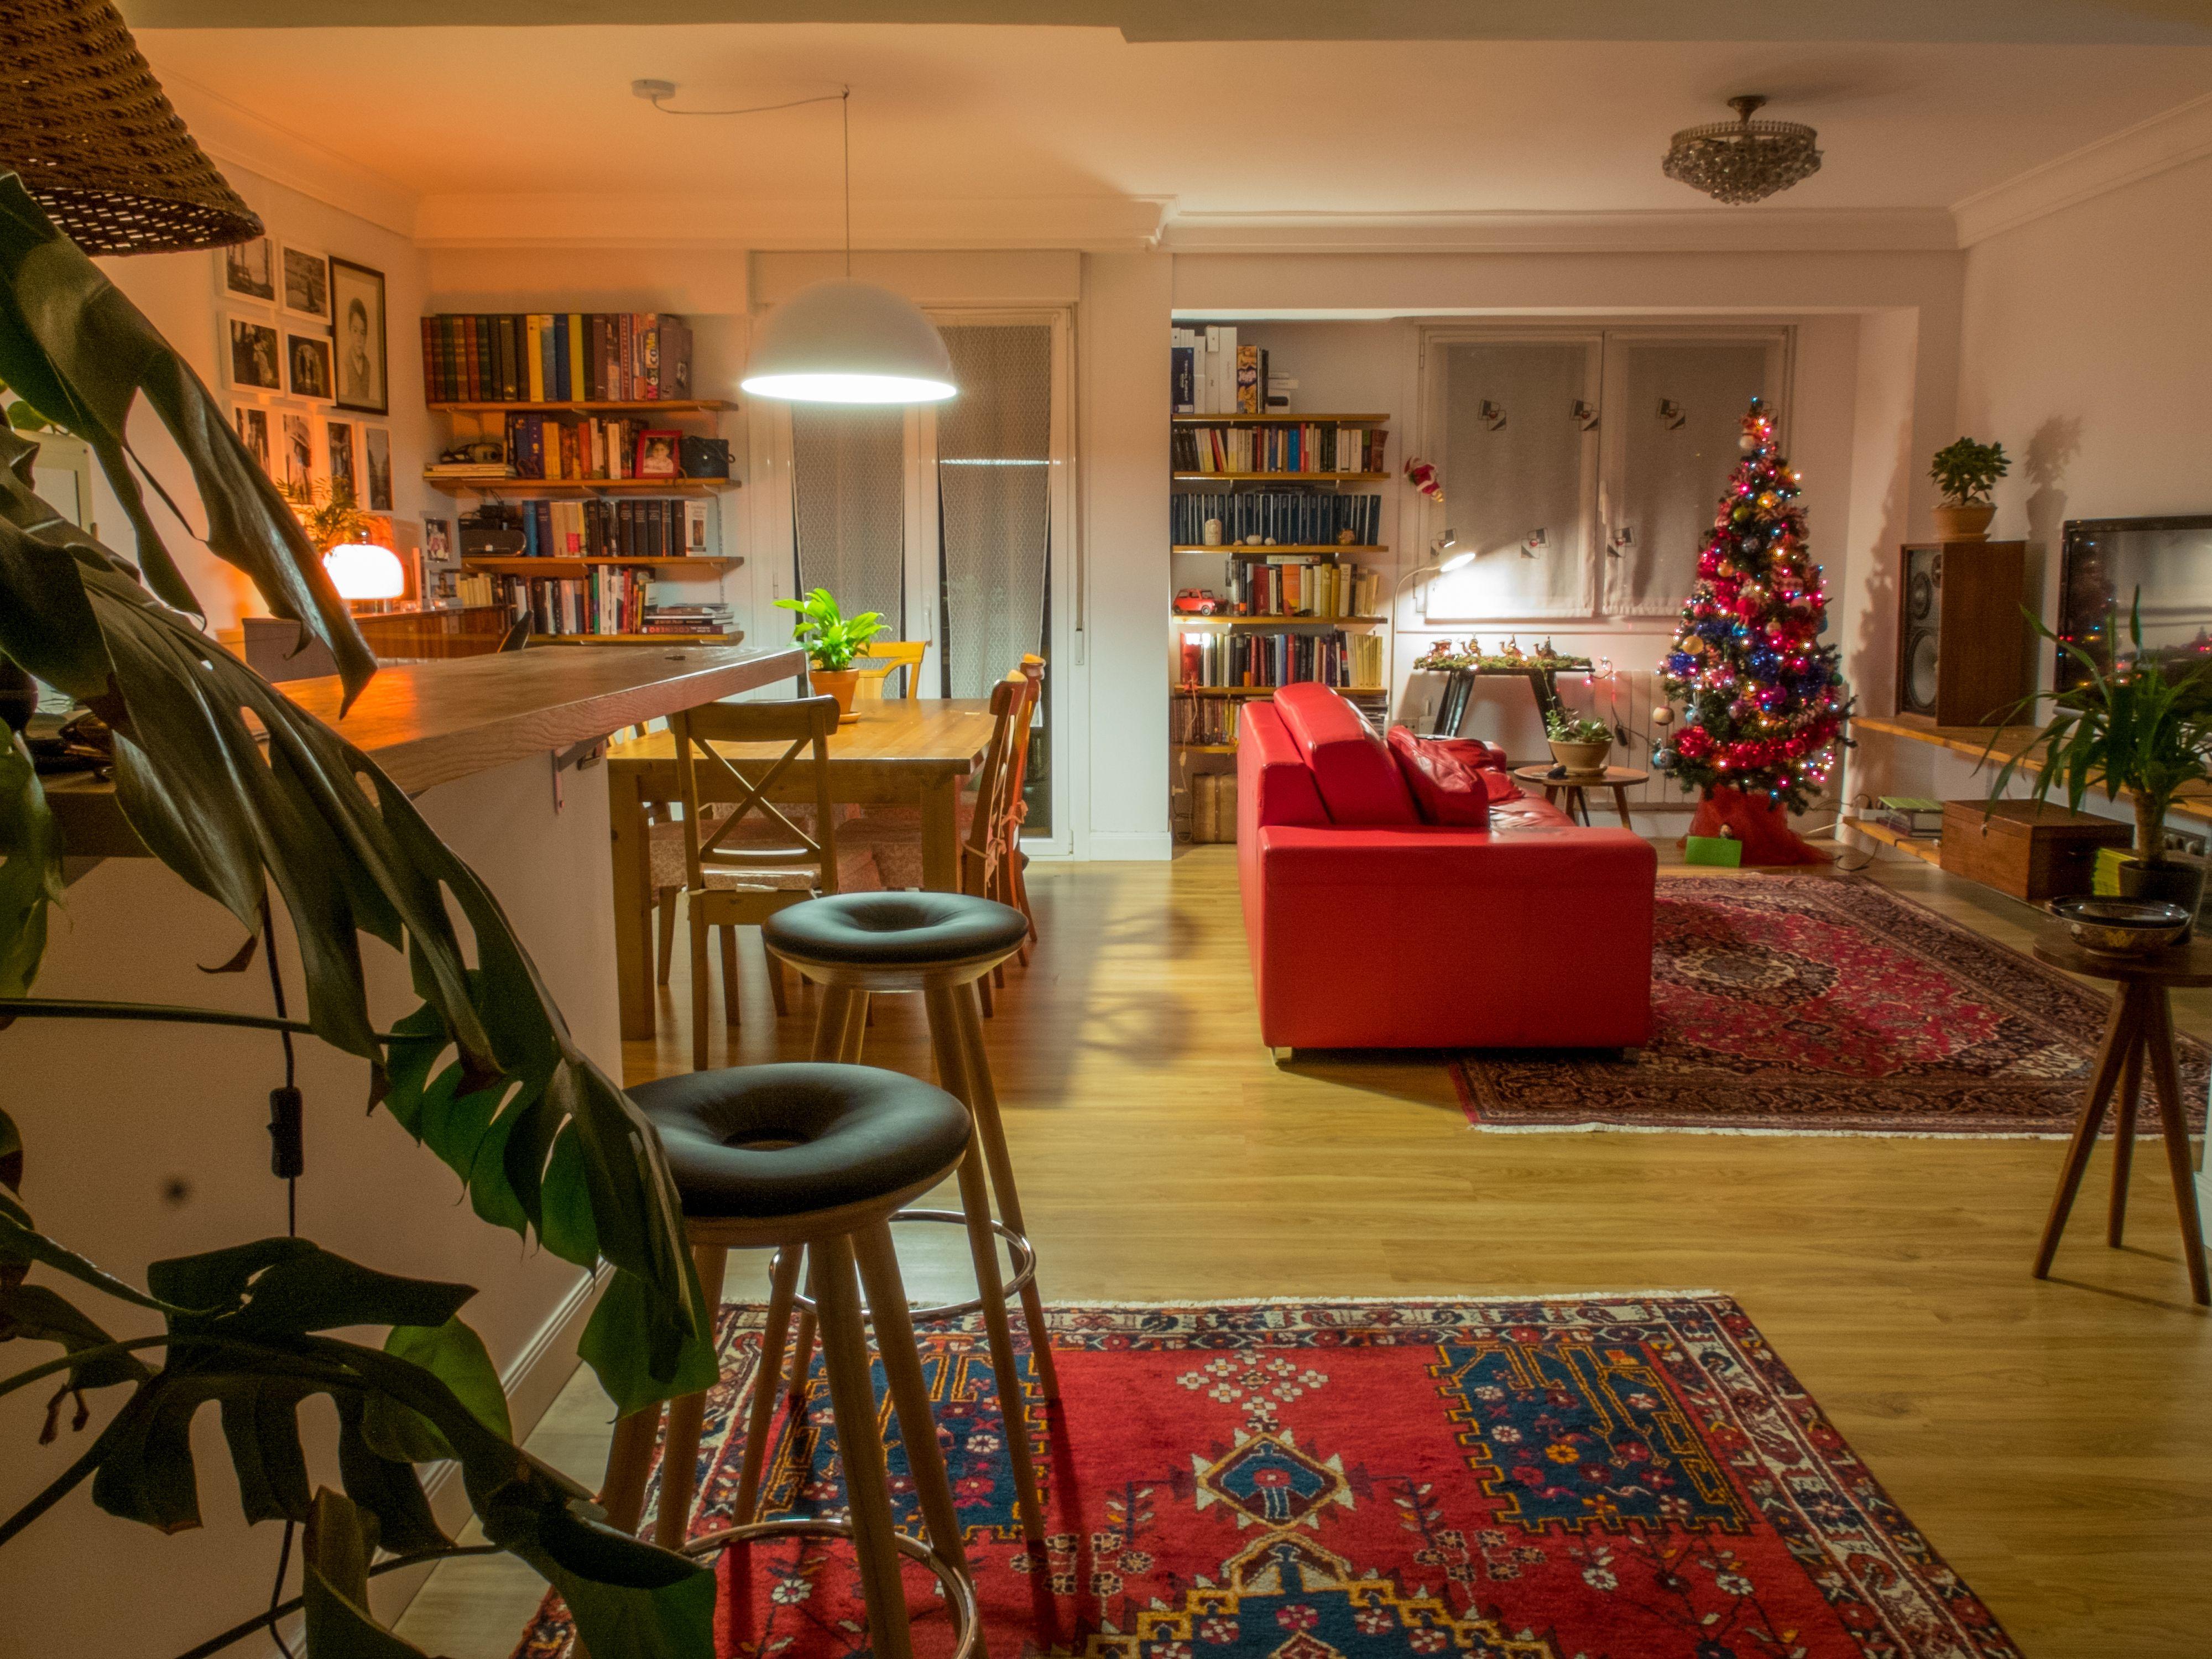 Pin de Julen Alvarez en Livingroom Pinterest Living Room